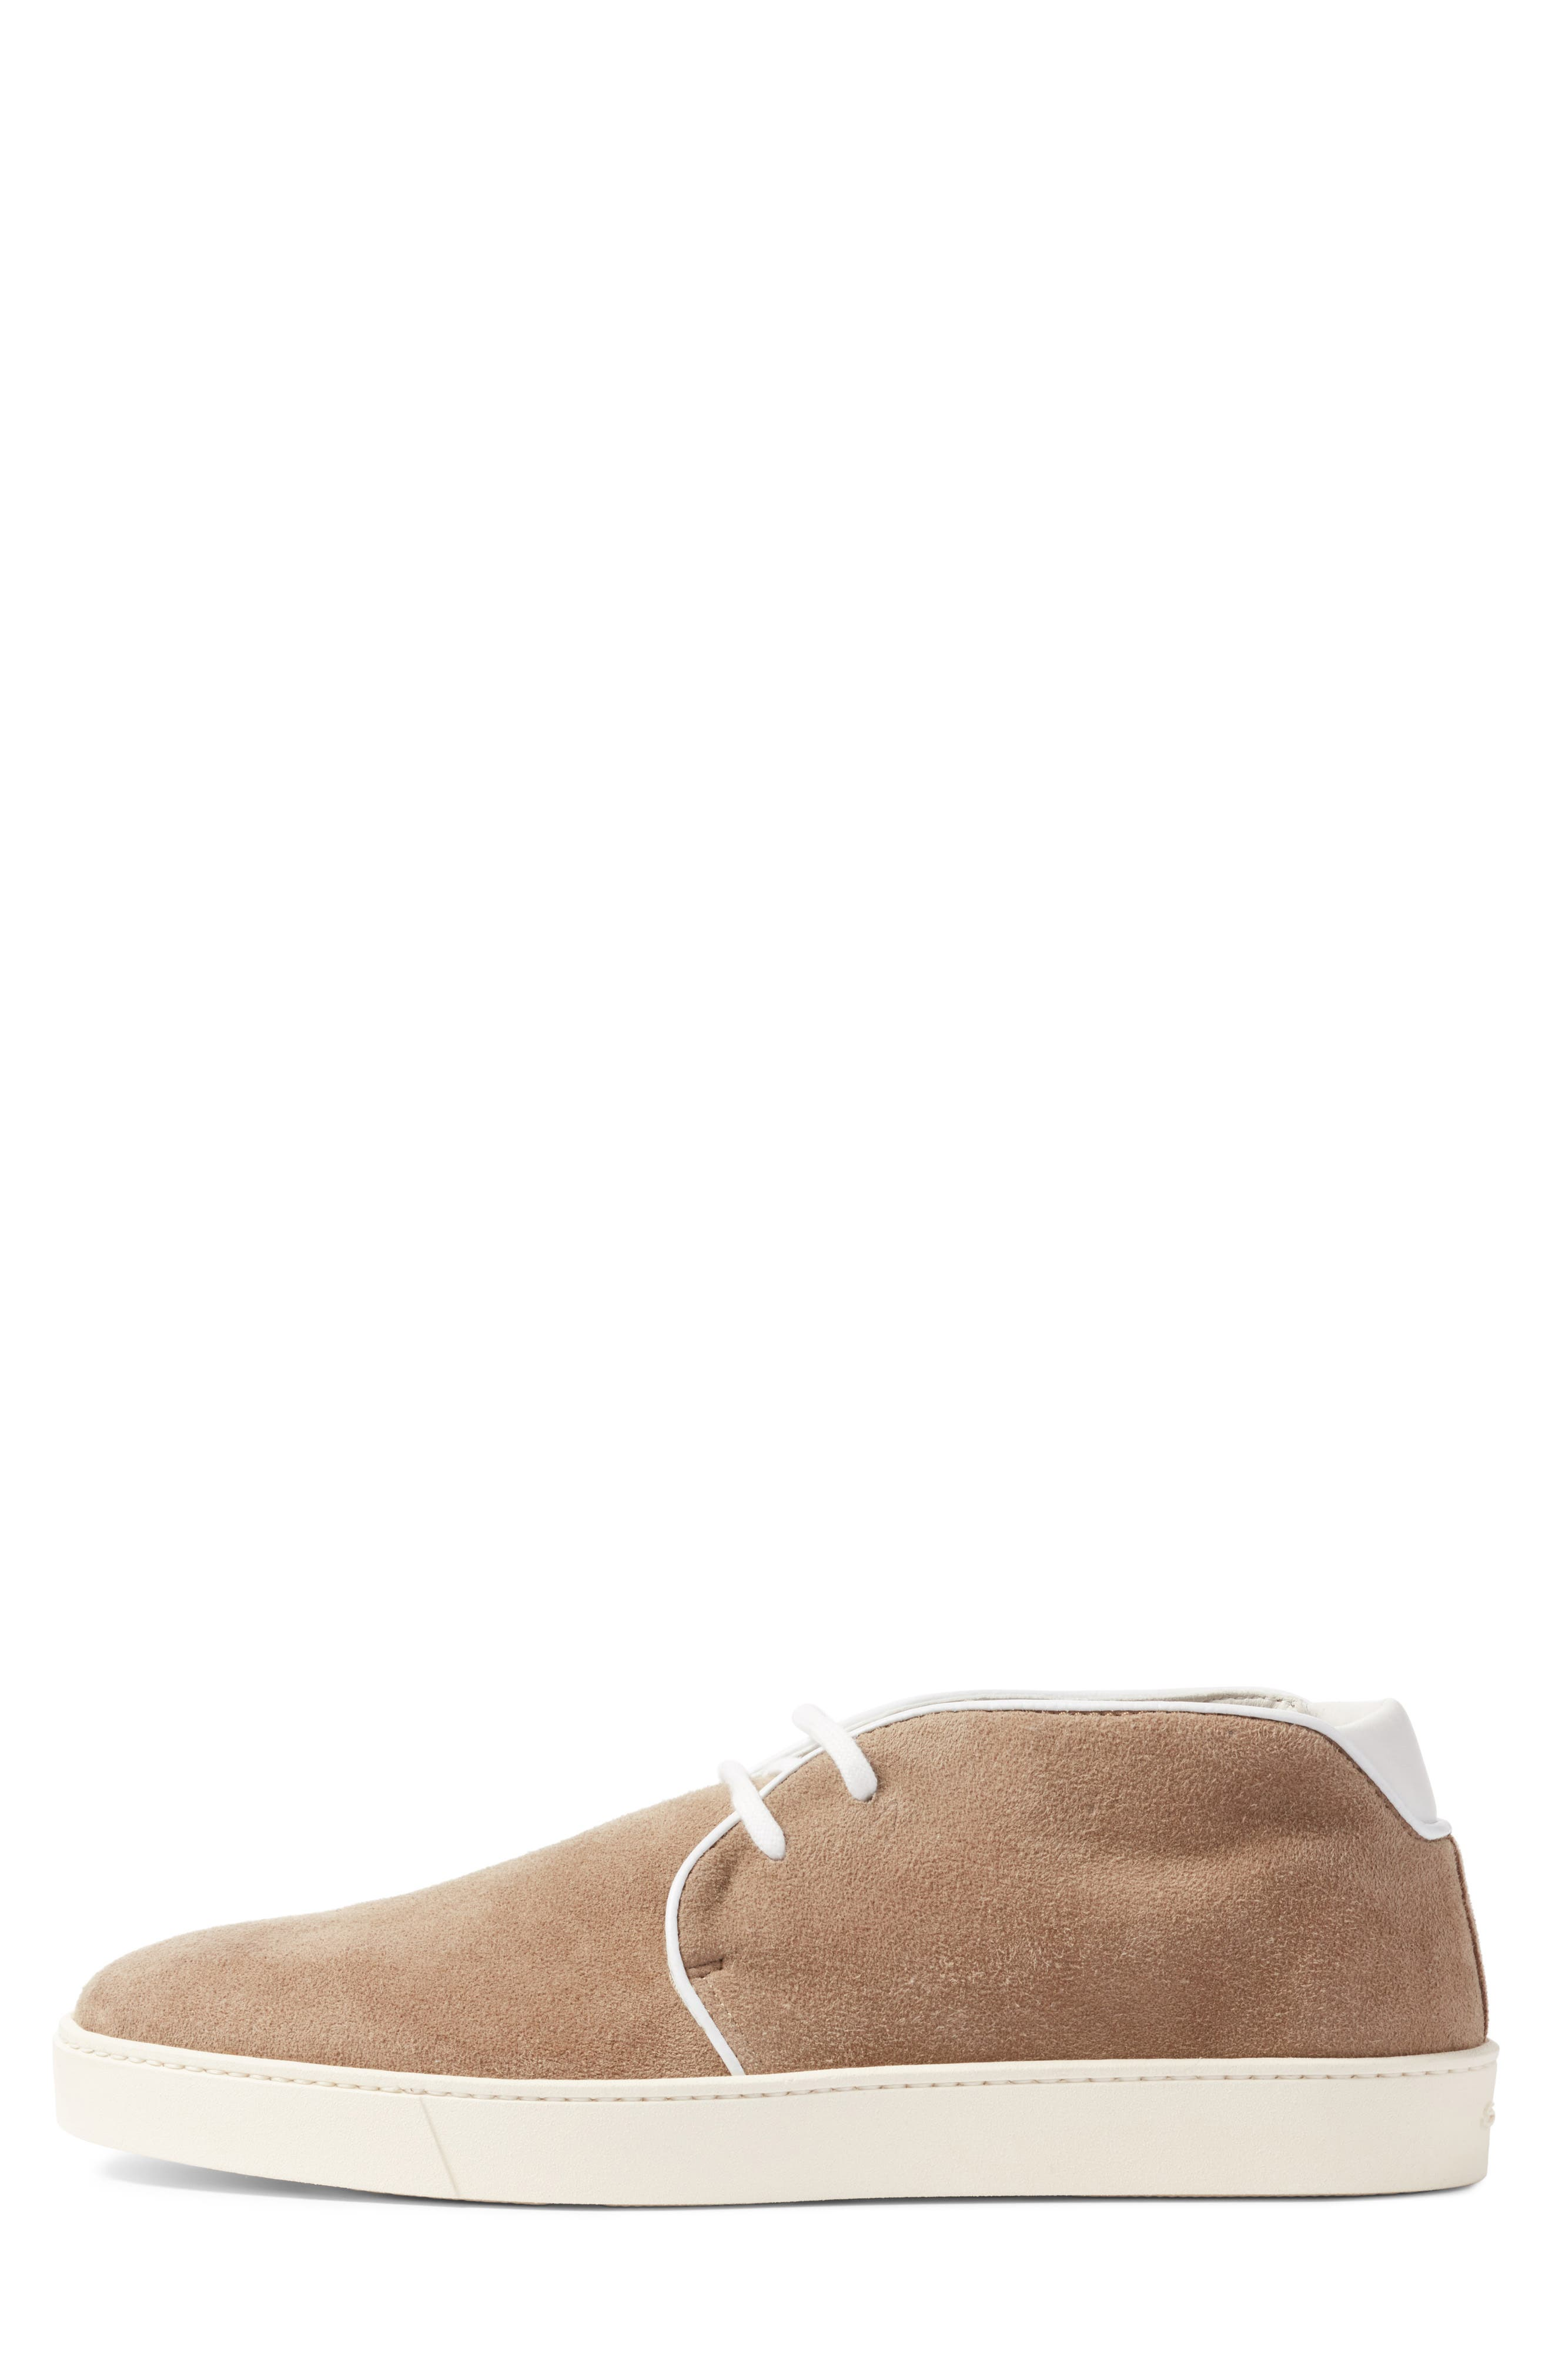 Alternate Image 3  - Santoni Huron Chukka Sneaker (Men)